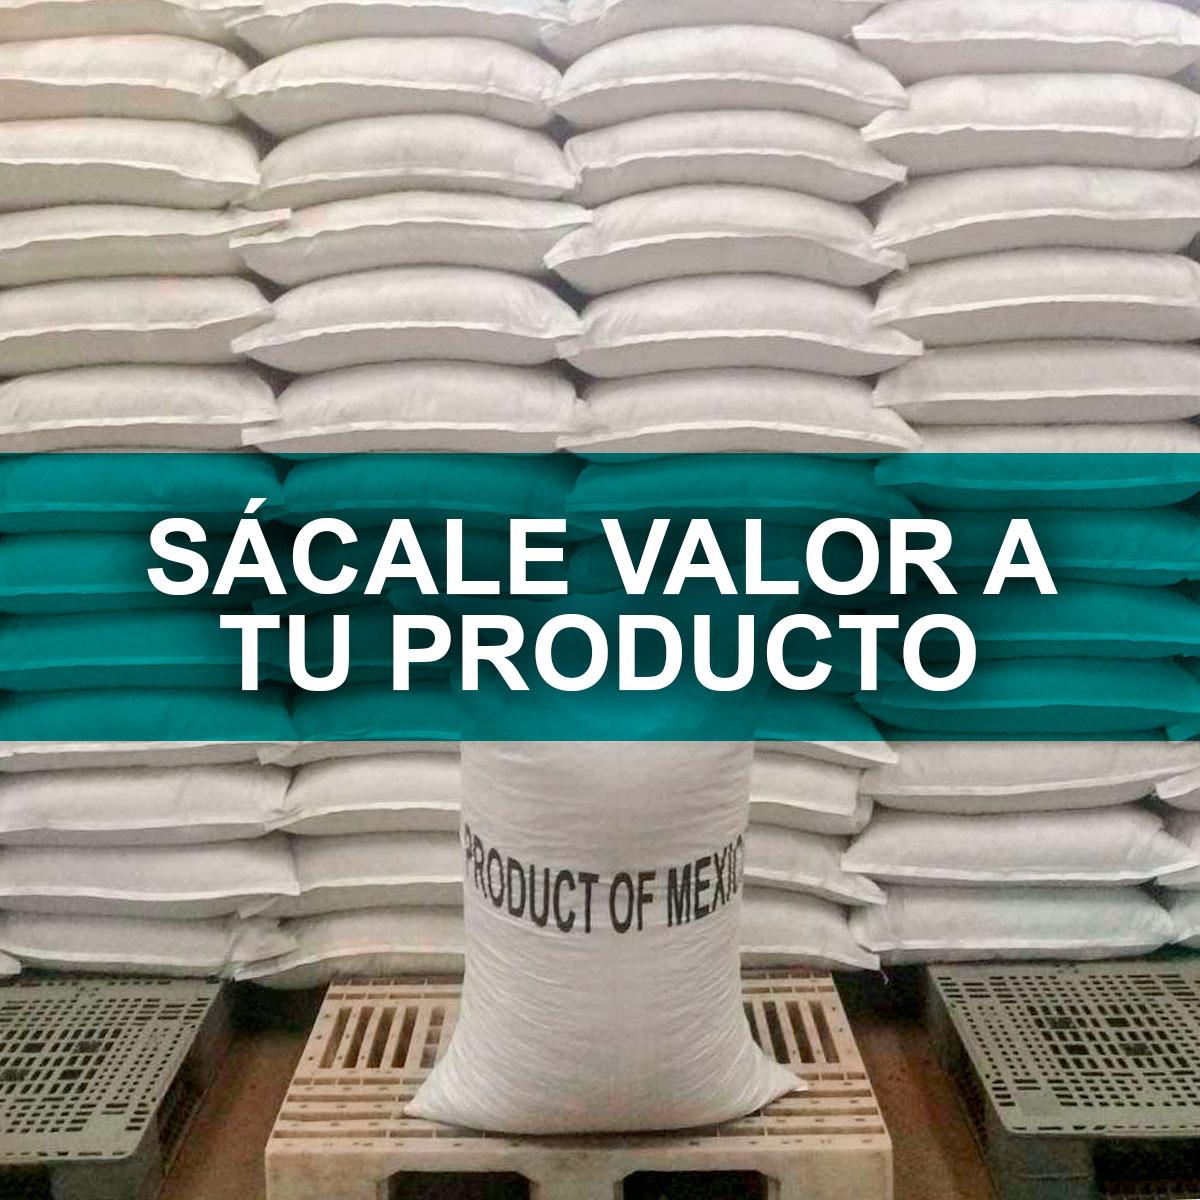 sácale-valor-a-tu-producto